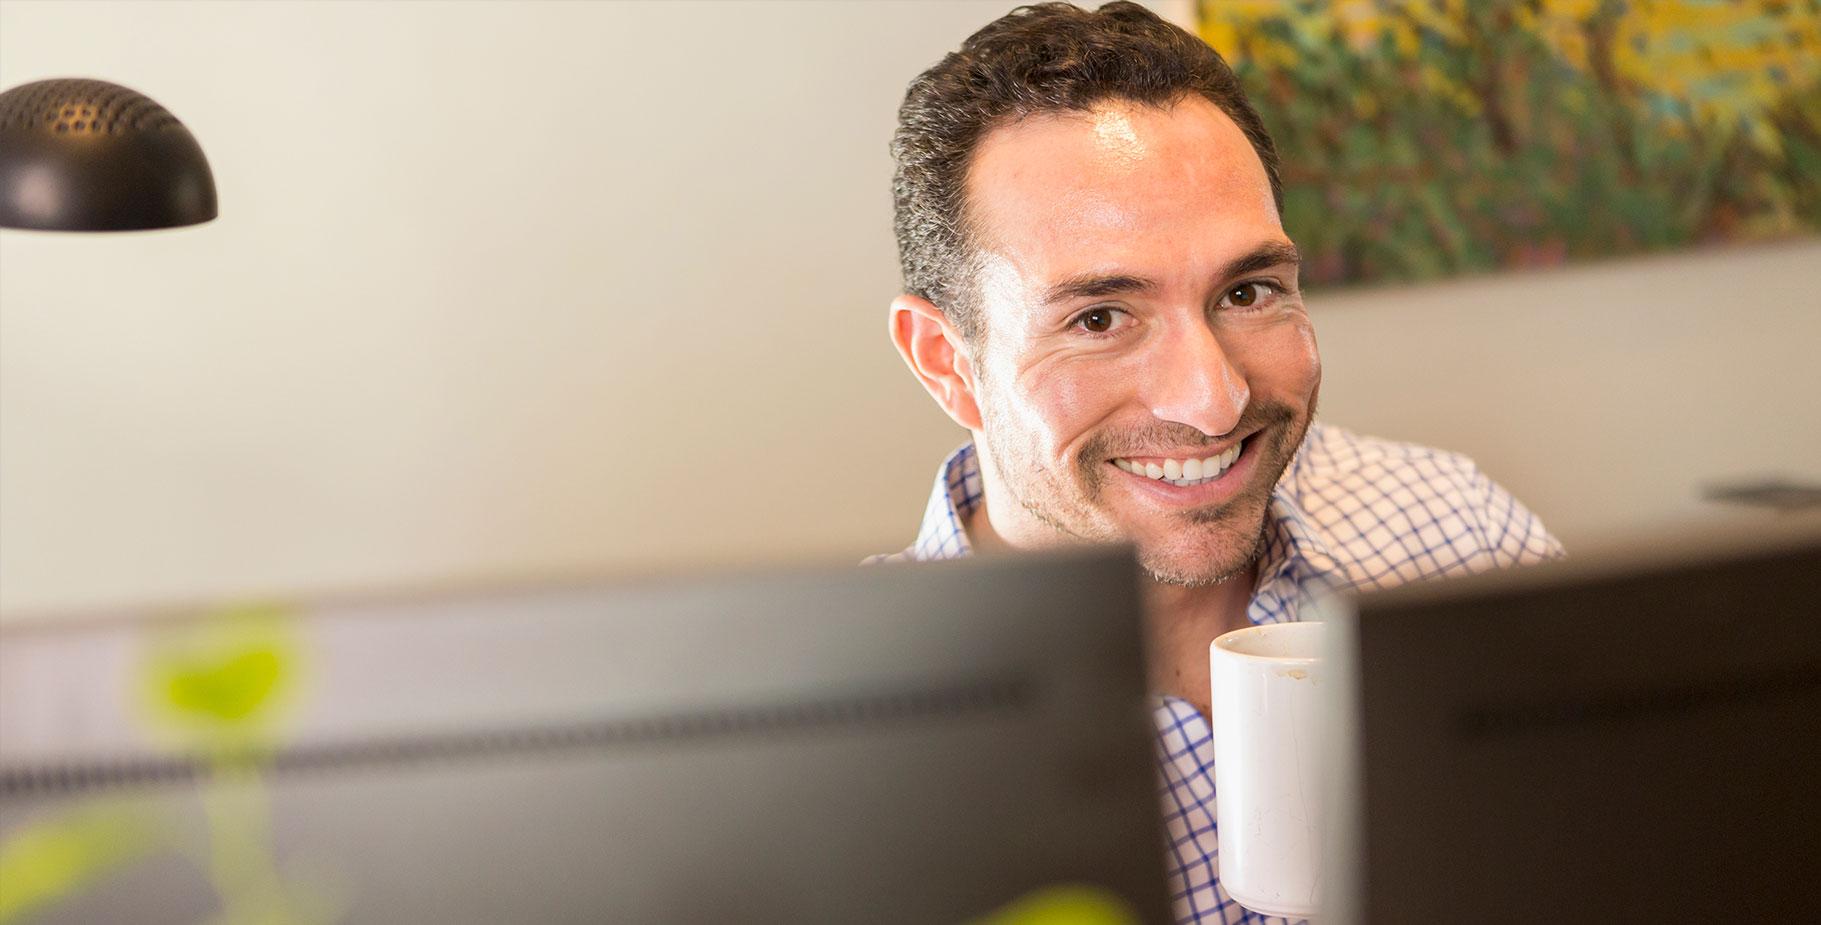 teleradiology career benefits